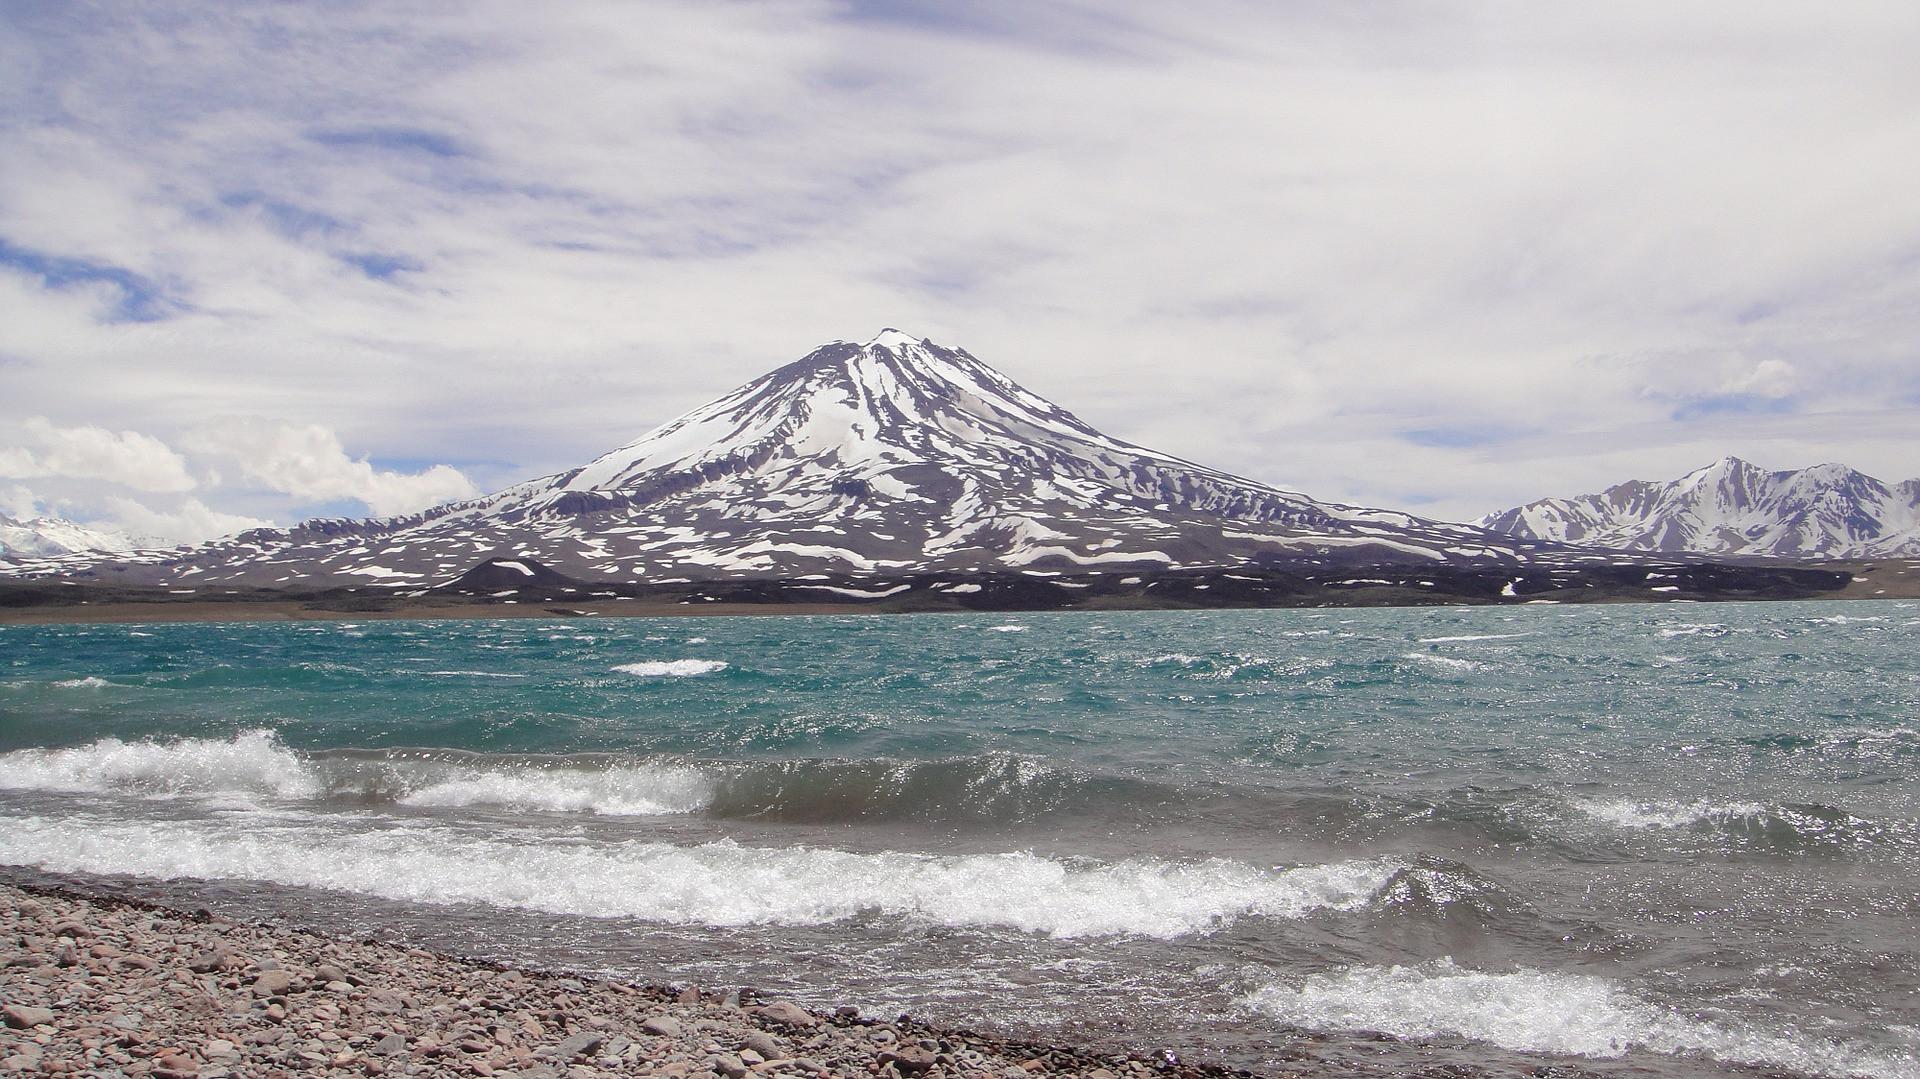 volcan-maipo-970095_1920.jpg